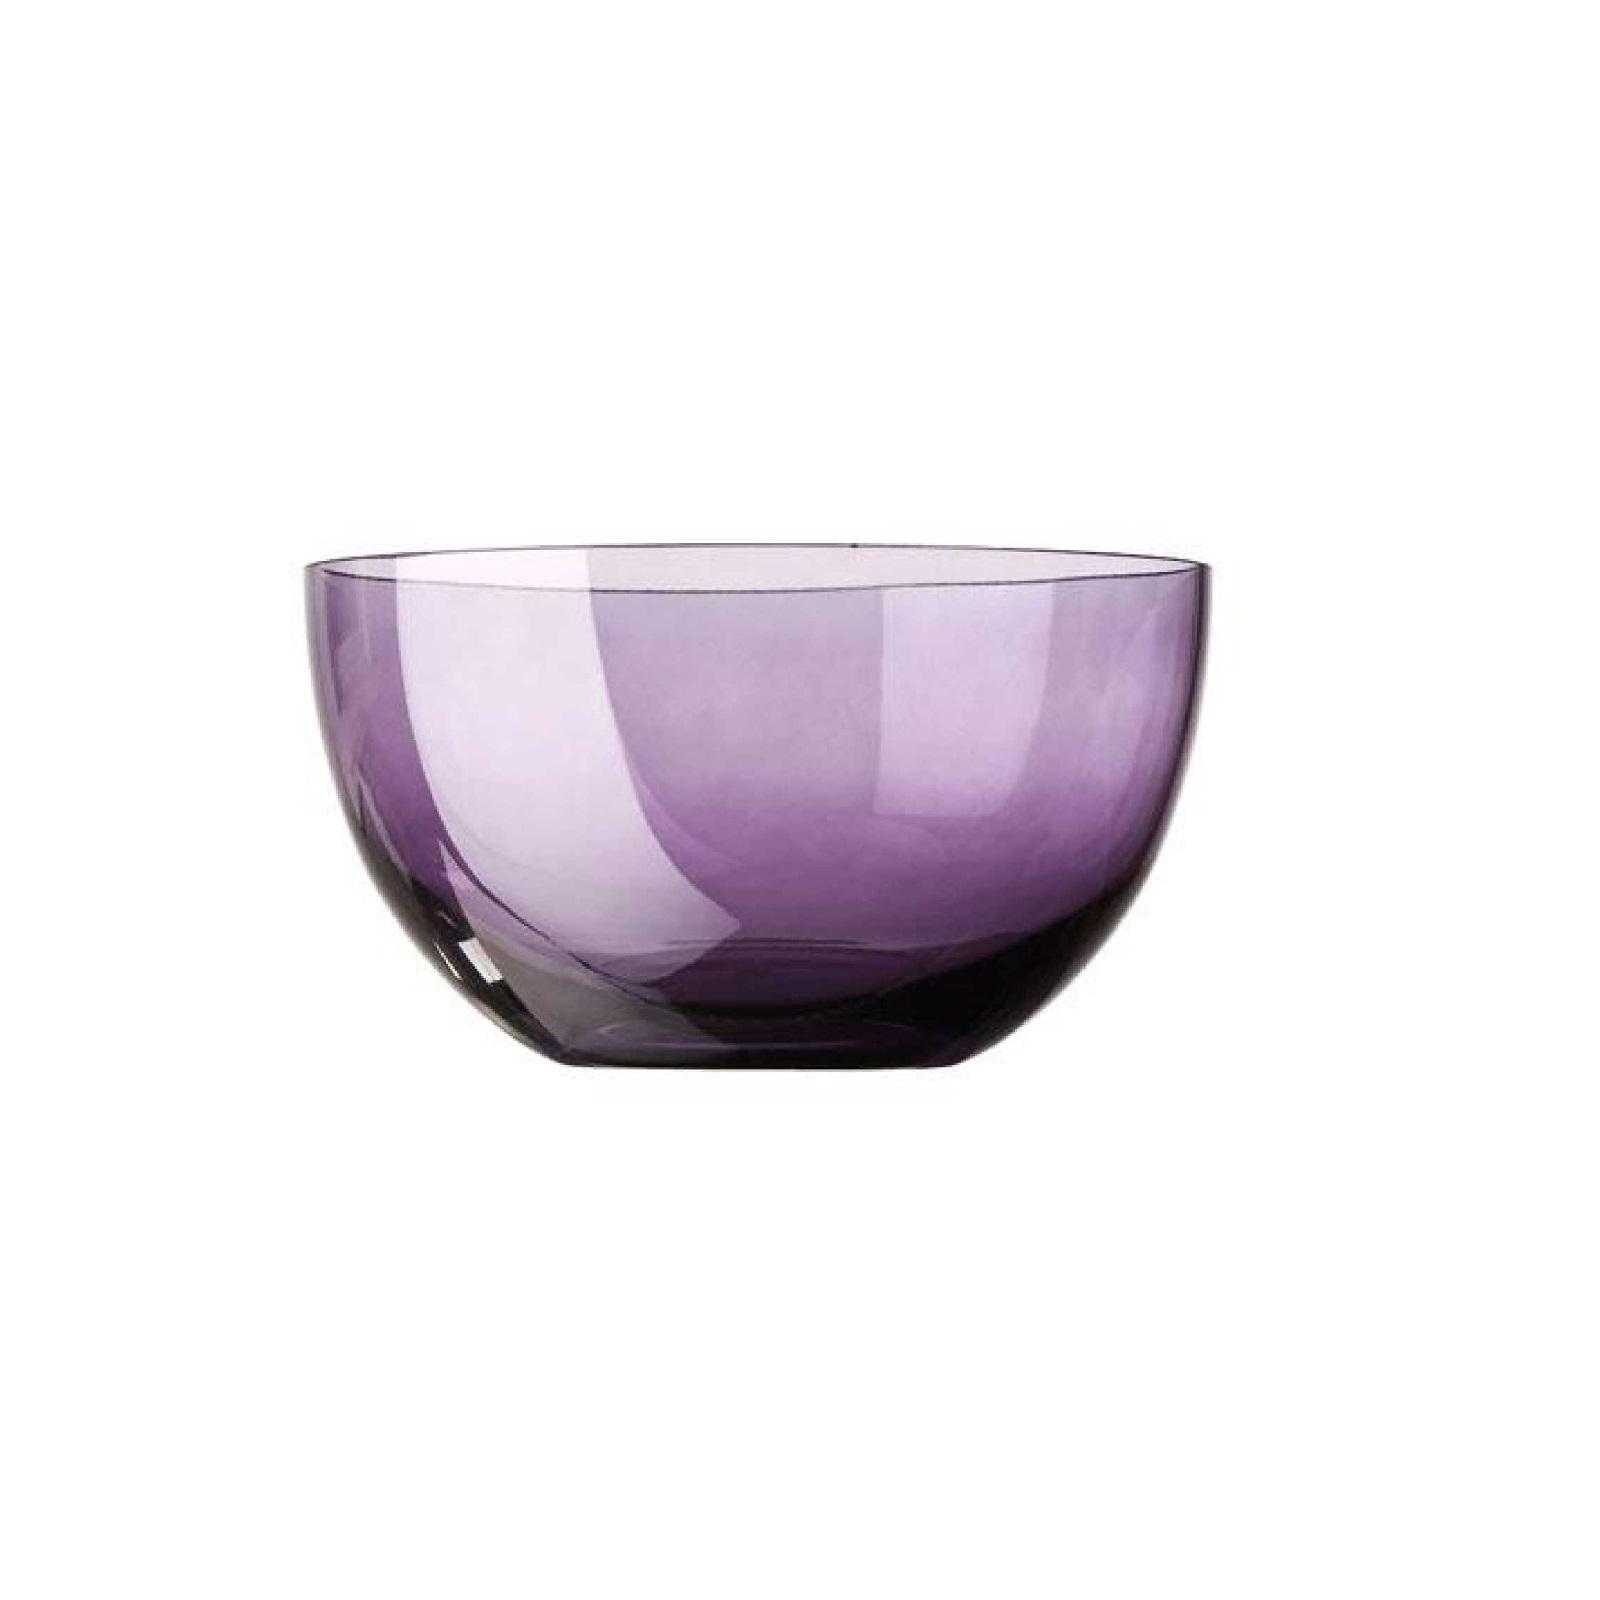 Салатник стеклянный Rosenthal SUNNY DAY, диаметр 22 см, фиолетовый Rosenthal 69034-408531-45322 фото 2